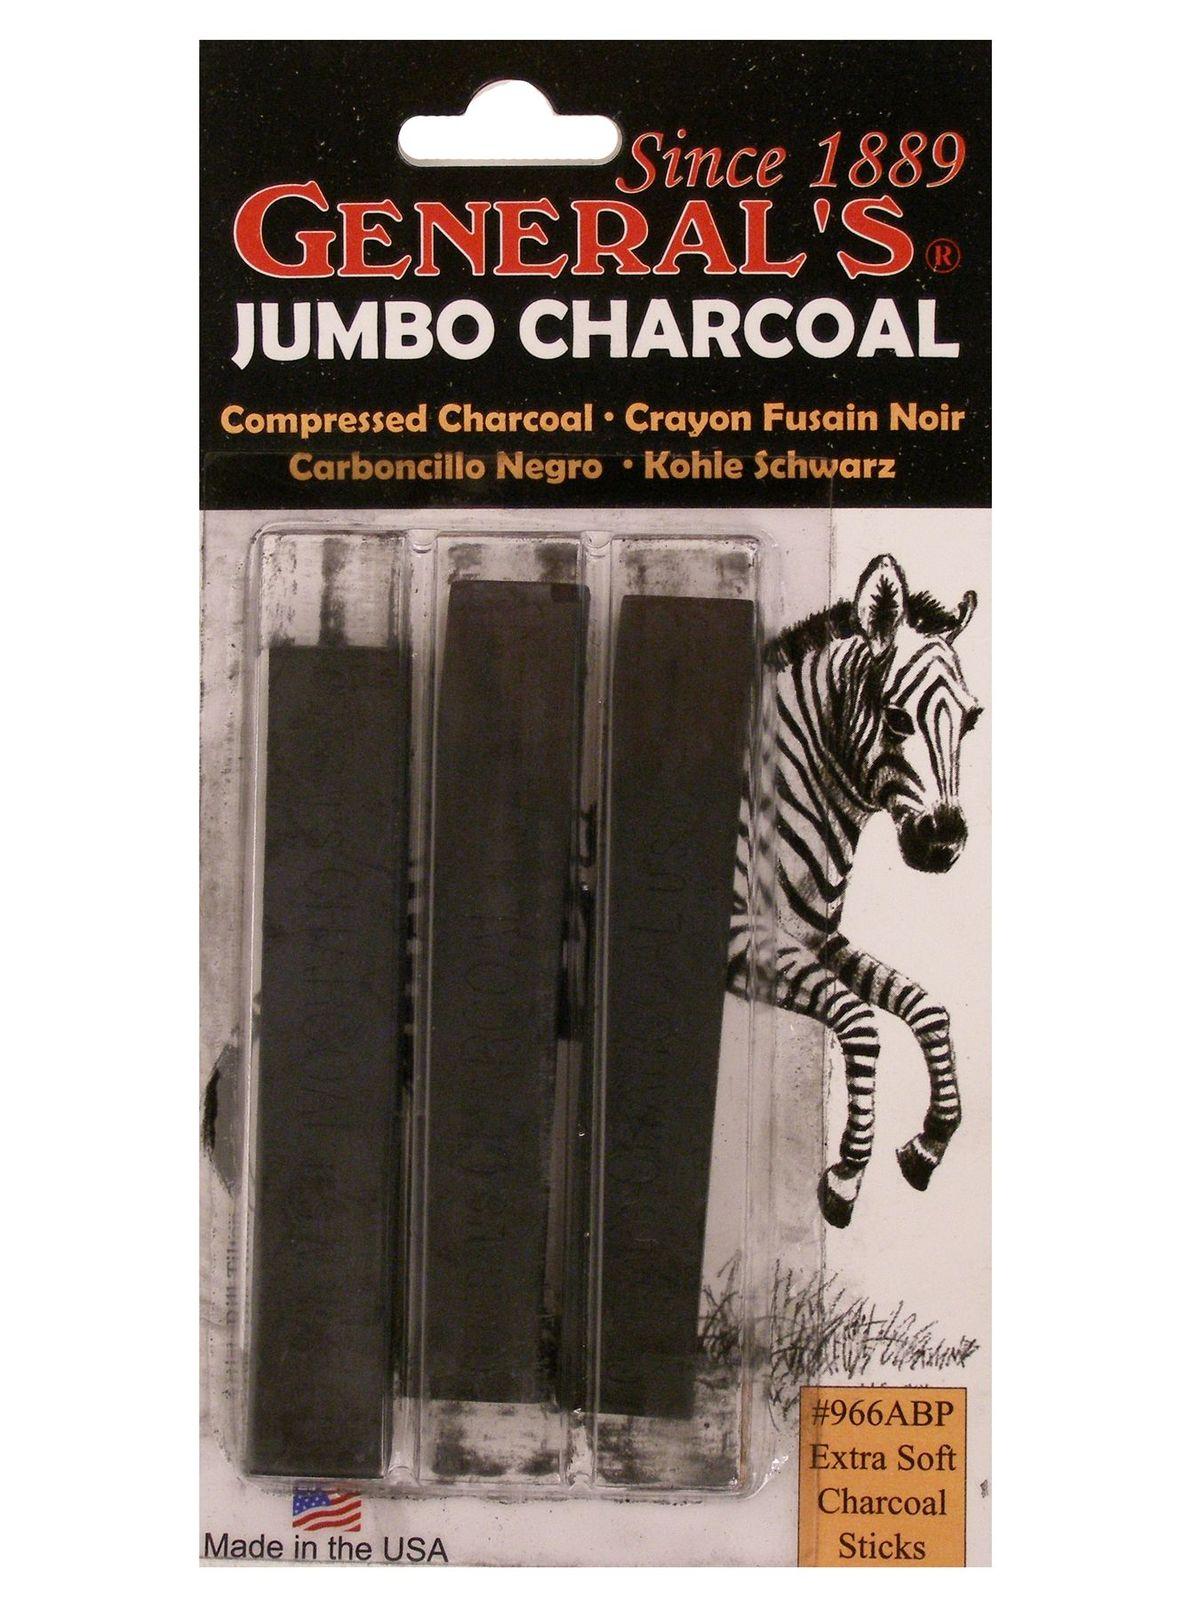 General's - Jumbo Charcoal